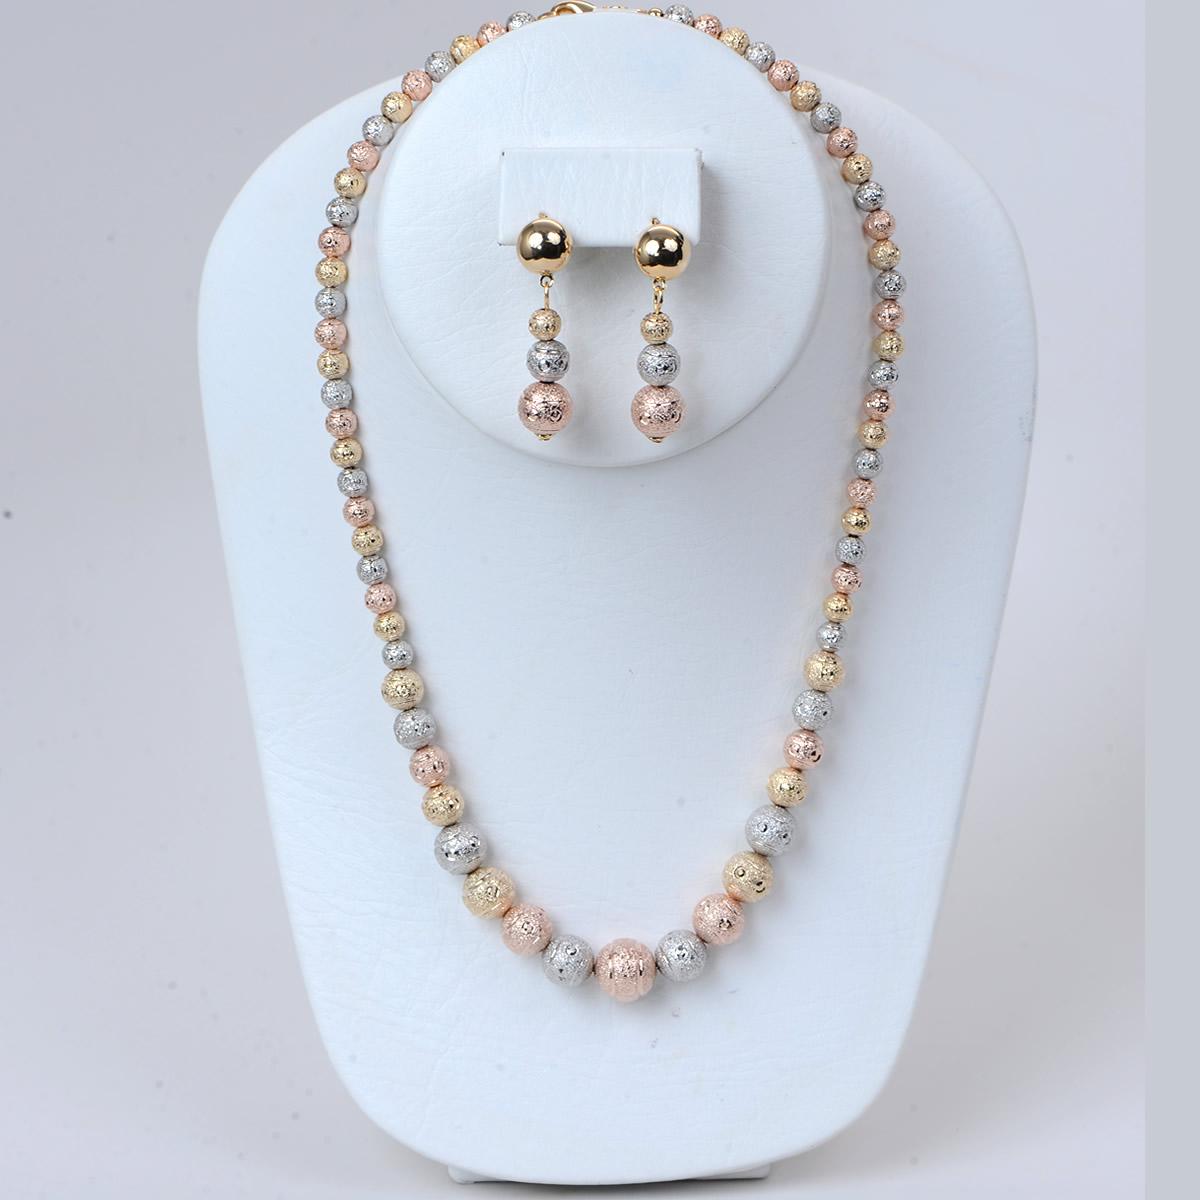 Glamorous collar Diamond Cut design with earrings